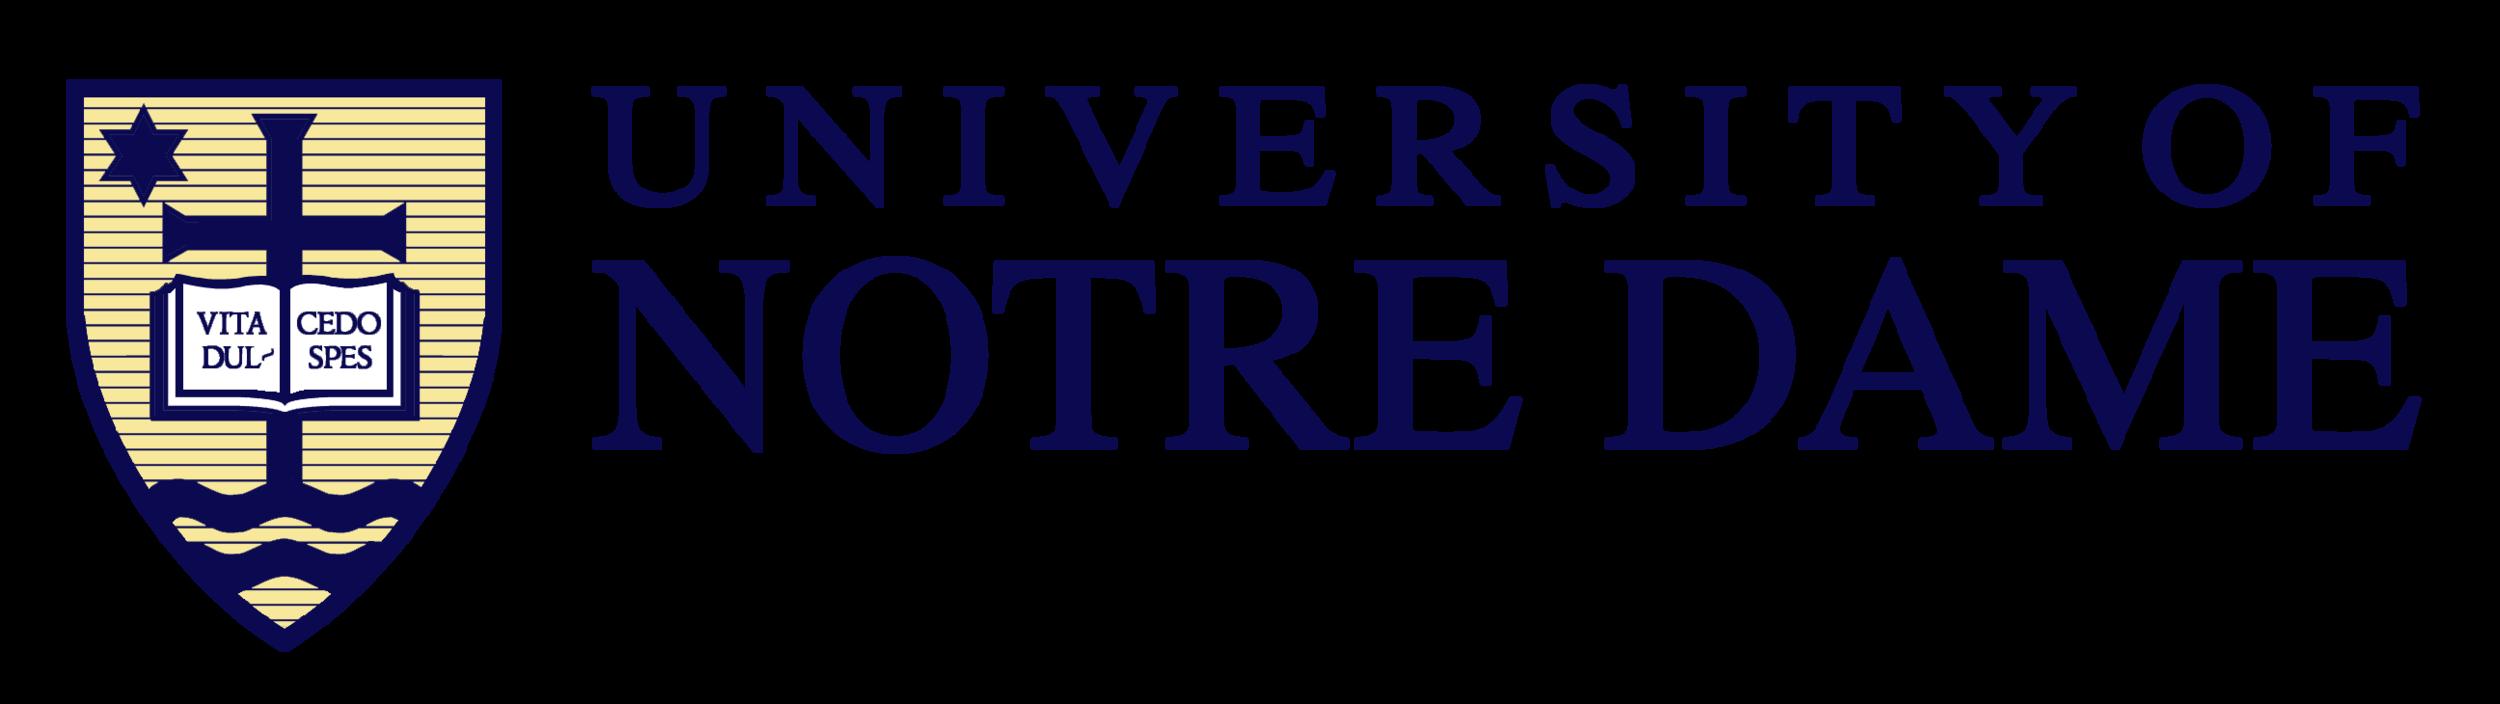 University_of_Notre_Dame_logo.png